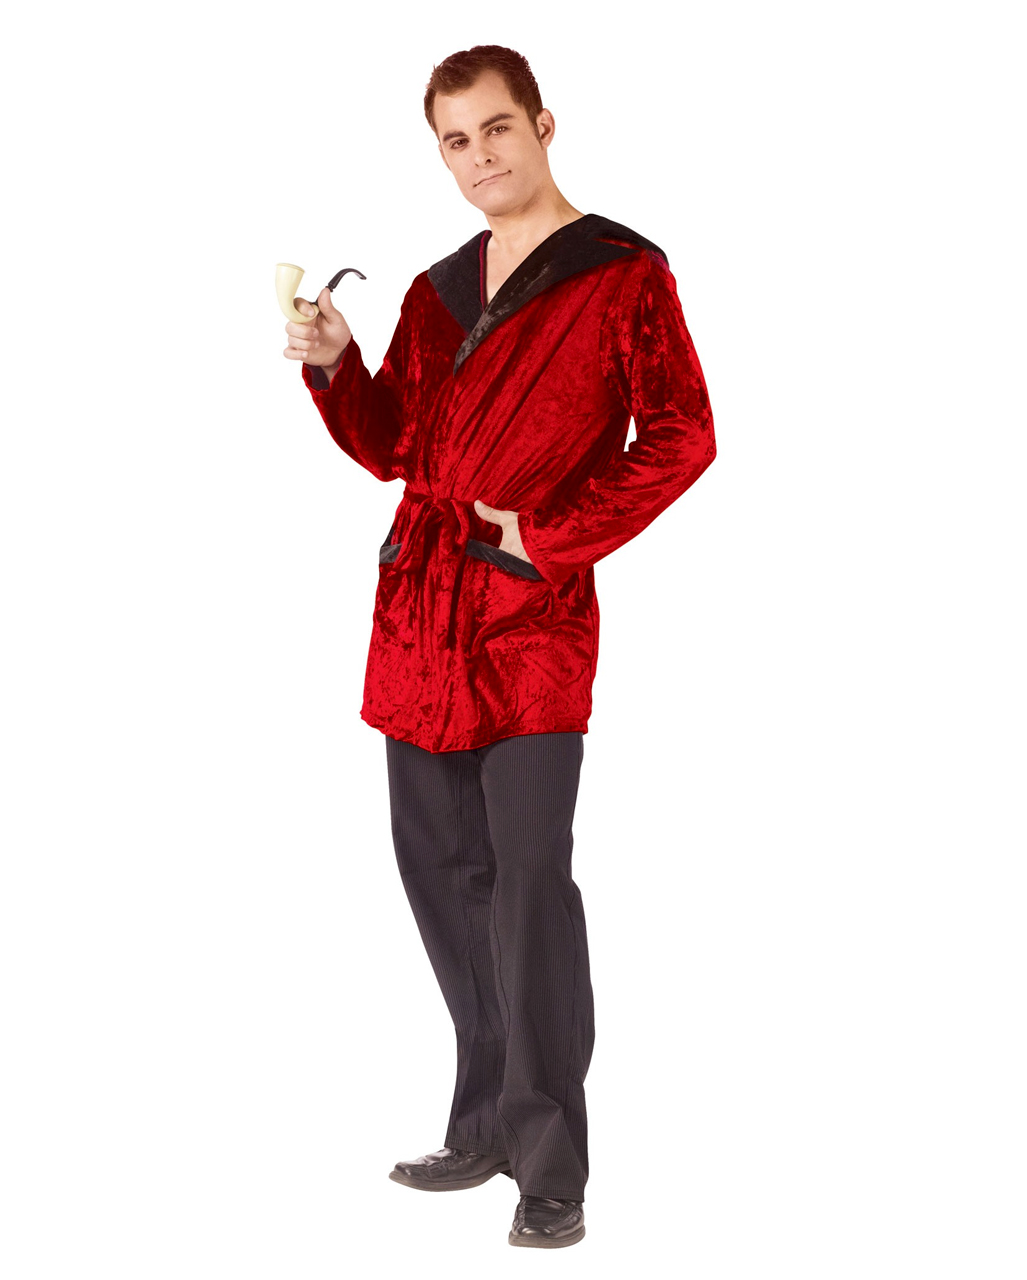 Playboy Dressing Gown With Pipe | Casanova costume | horror-shop.com